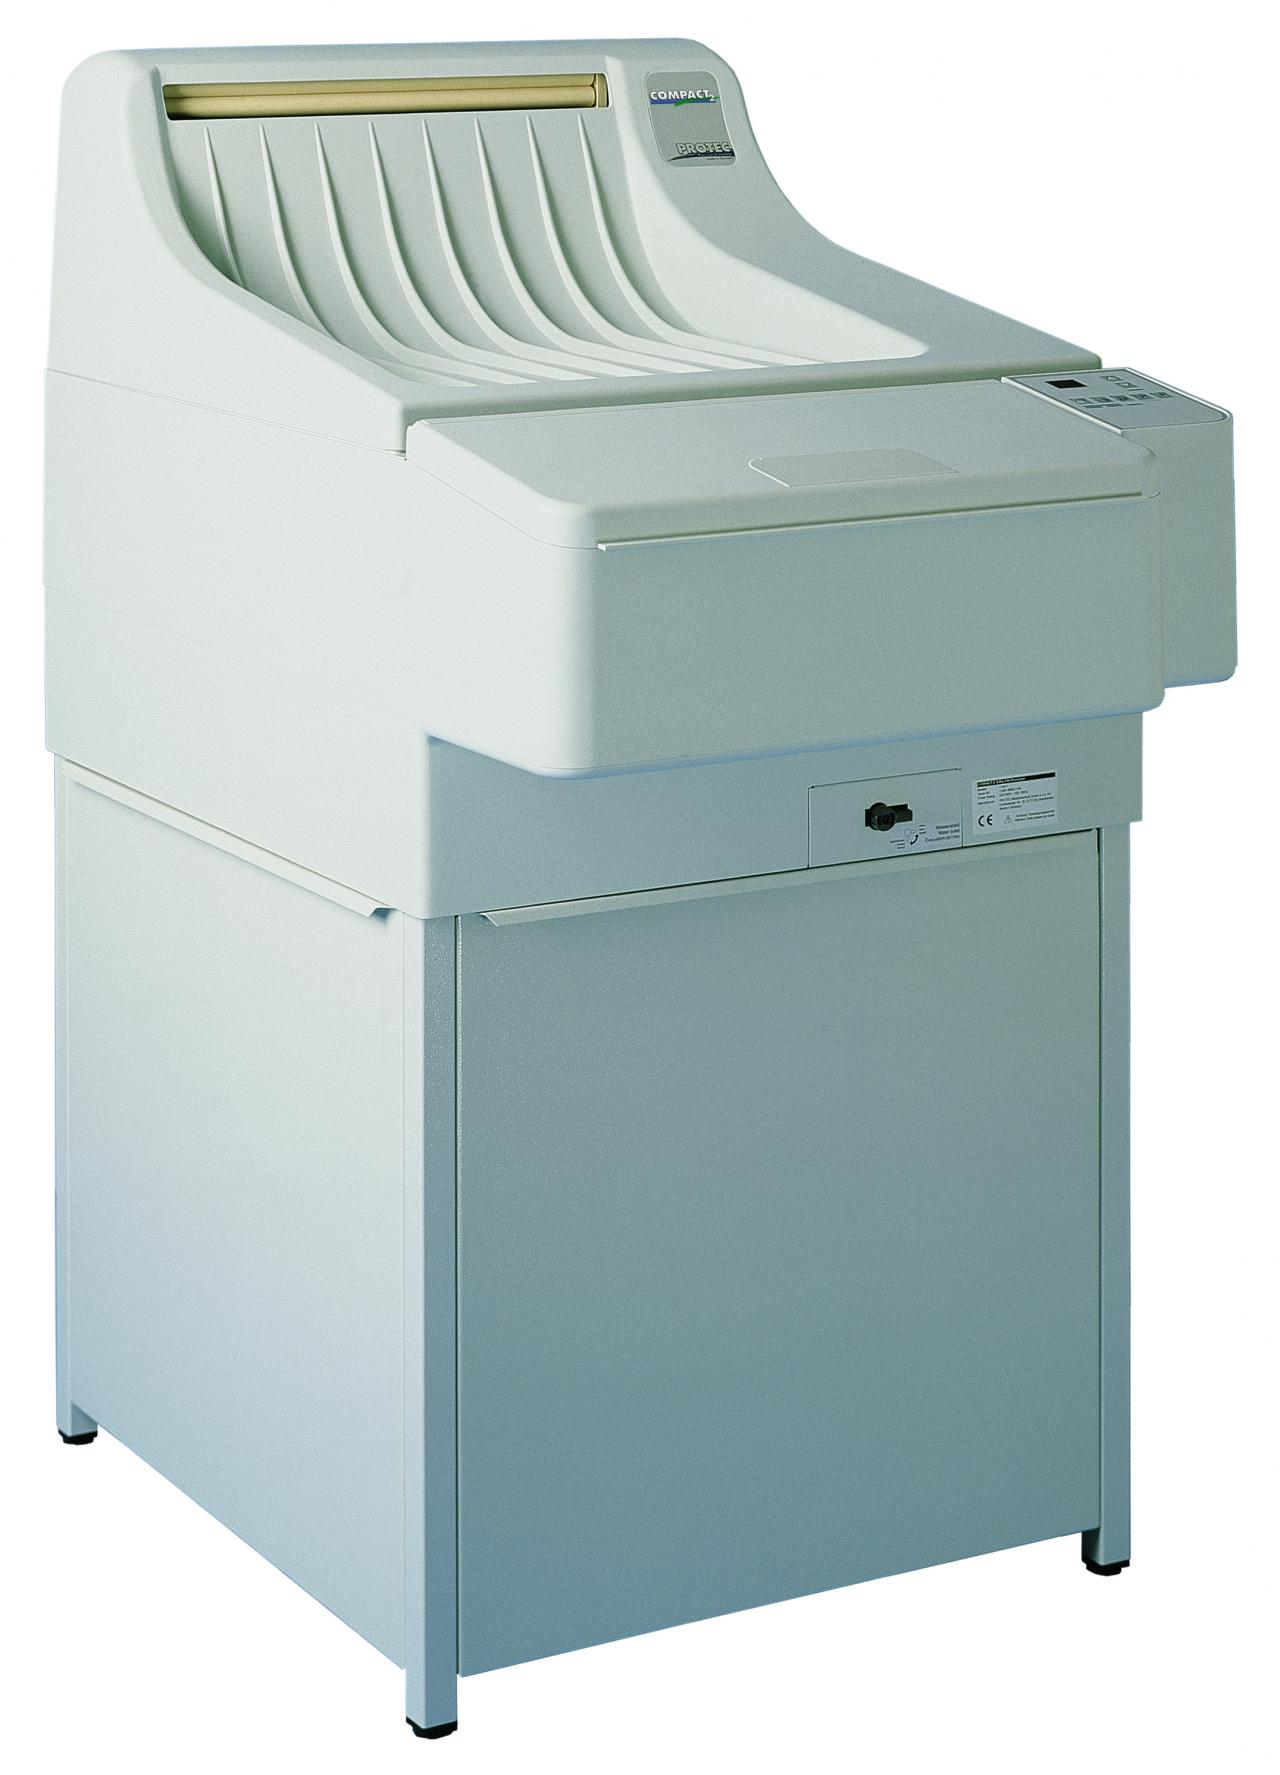 Protec Compact 2 X Ray Film Processor